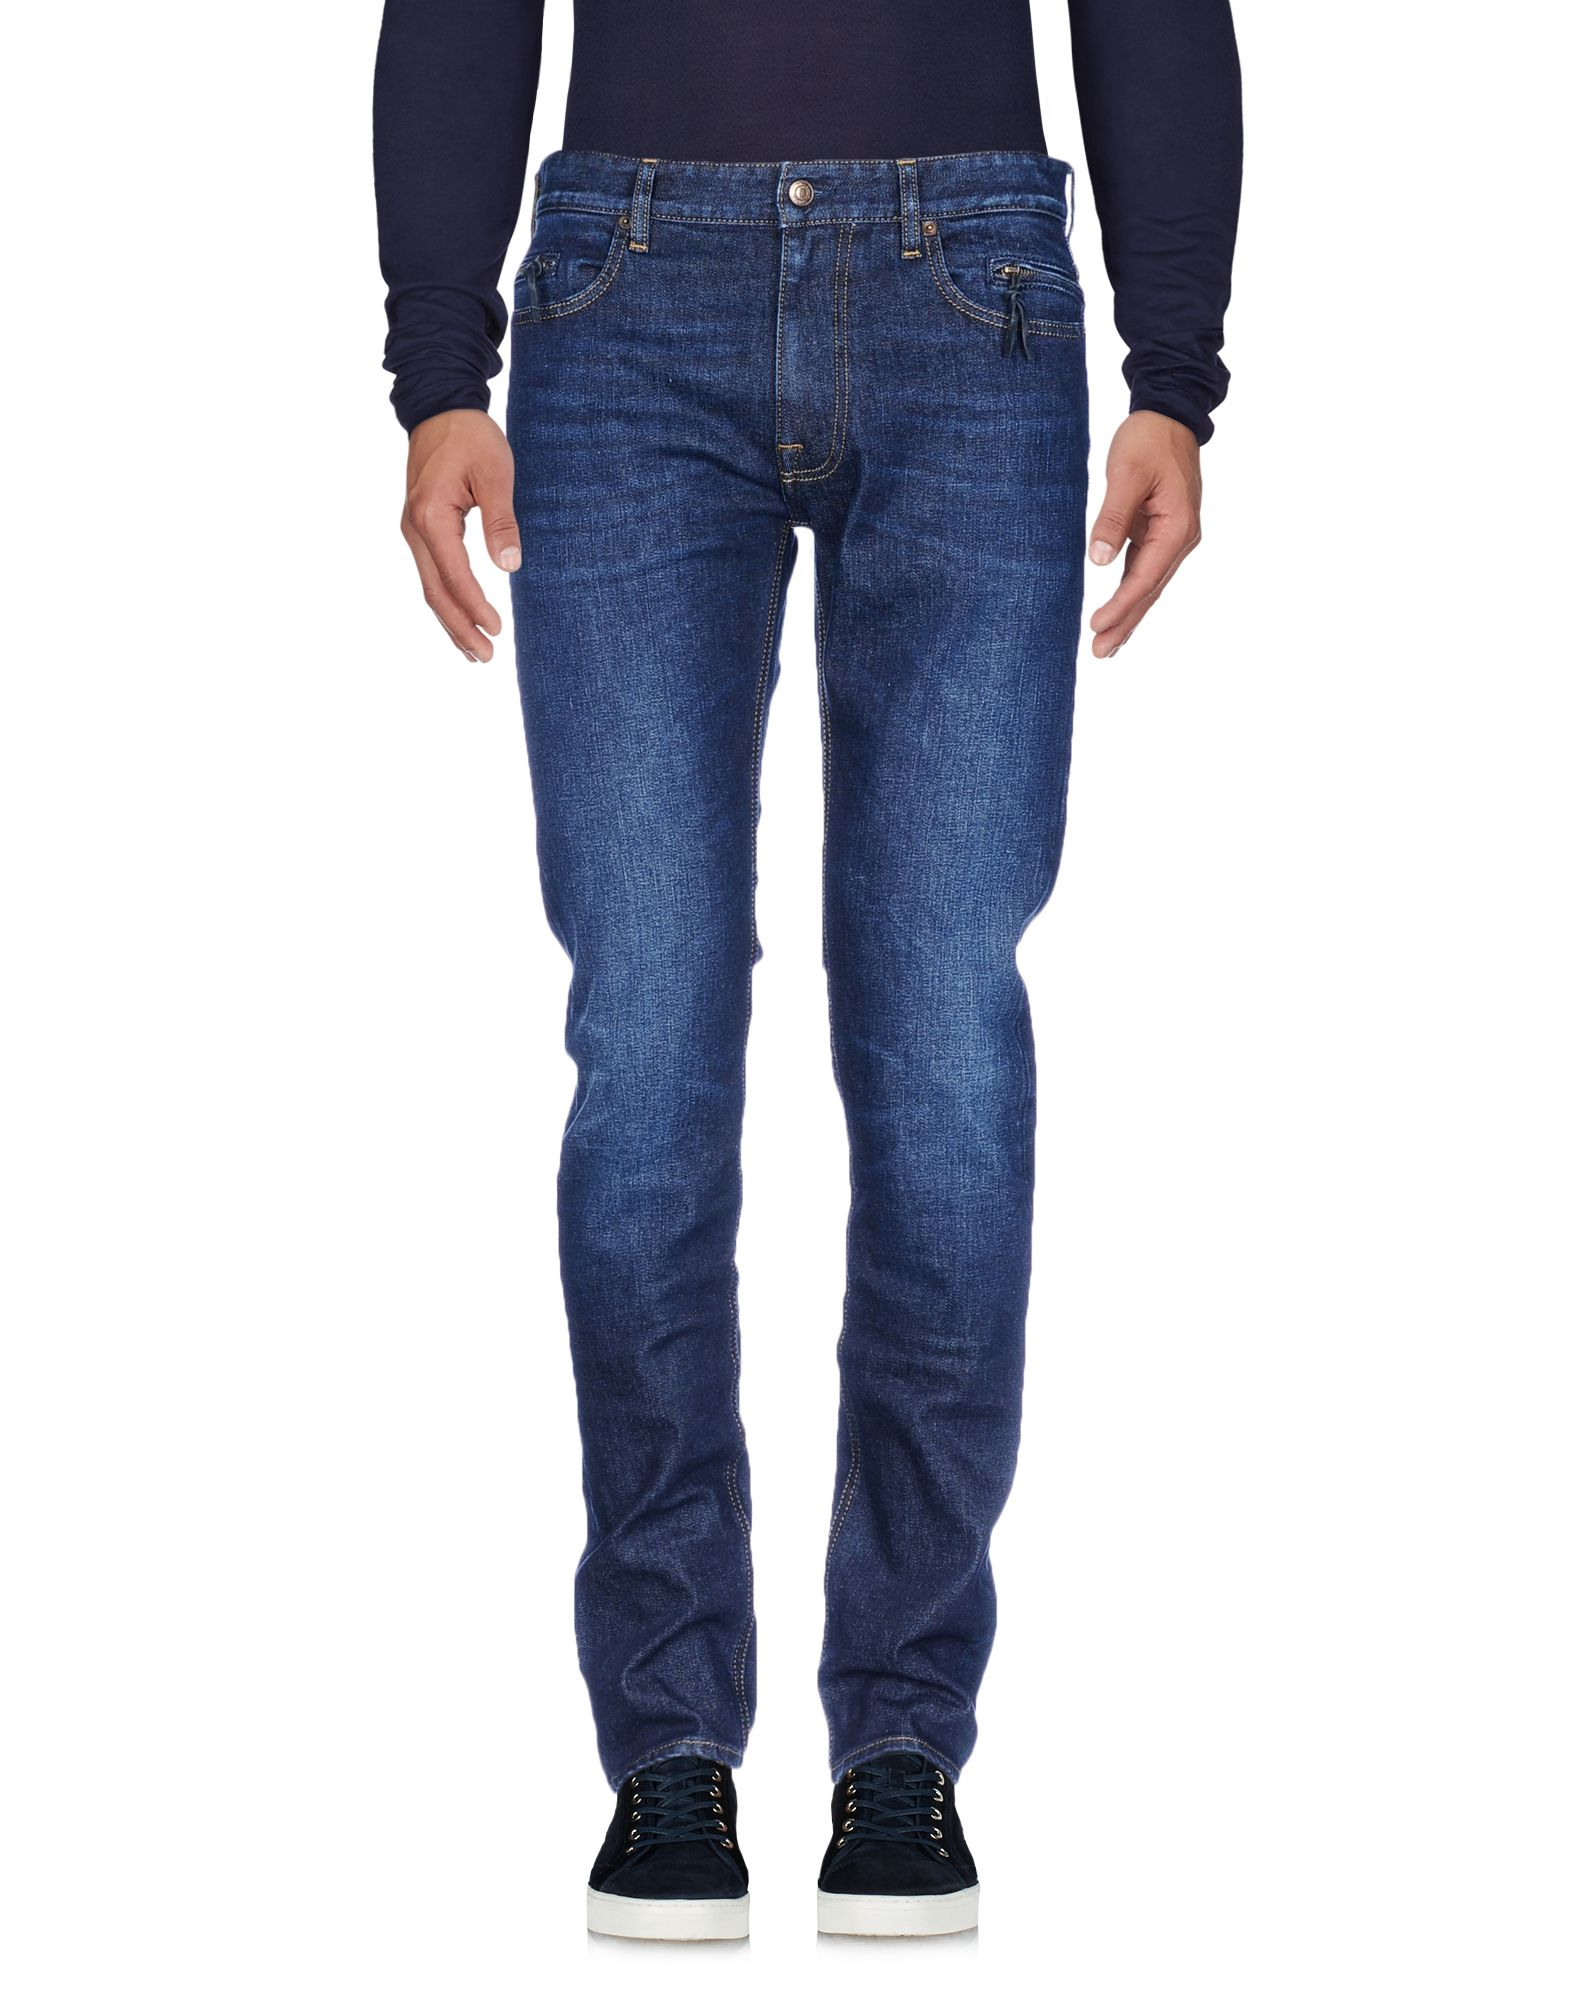 Pantaloni Jeans Grifoni Mauro Grifoni Jeans Uomo - 42681086CR a85896